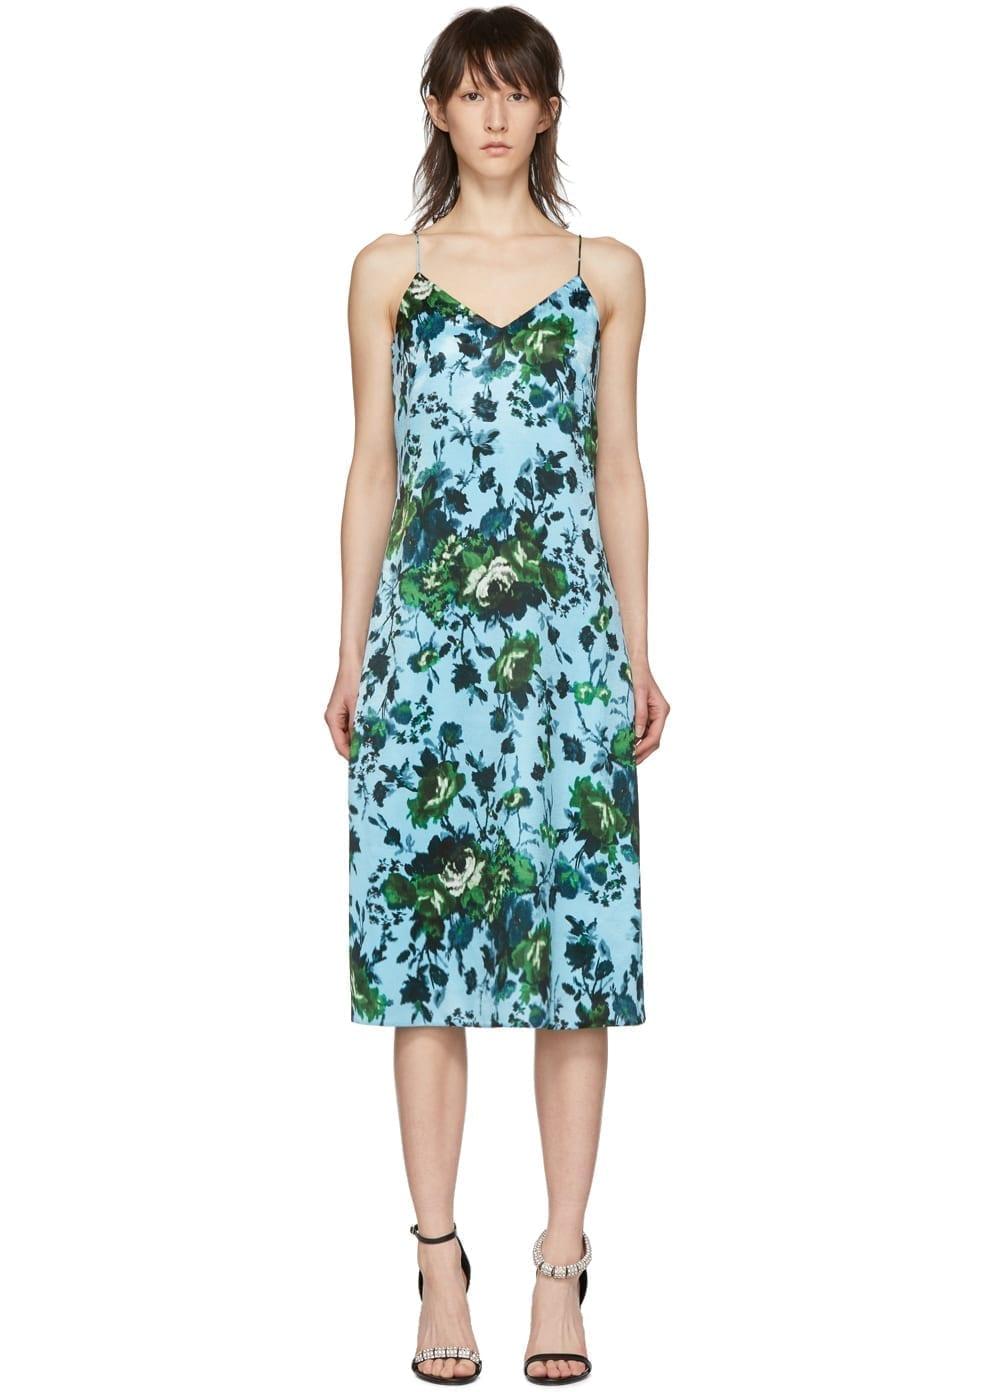 ERDEM Fitzroy Rose Vivianne Blue Dress